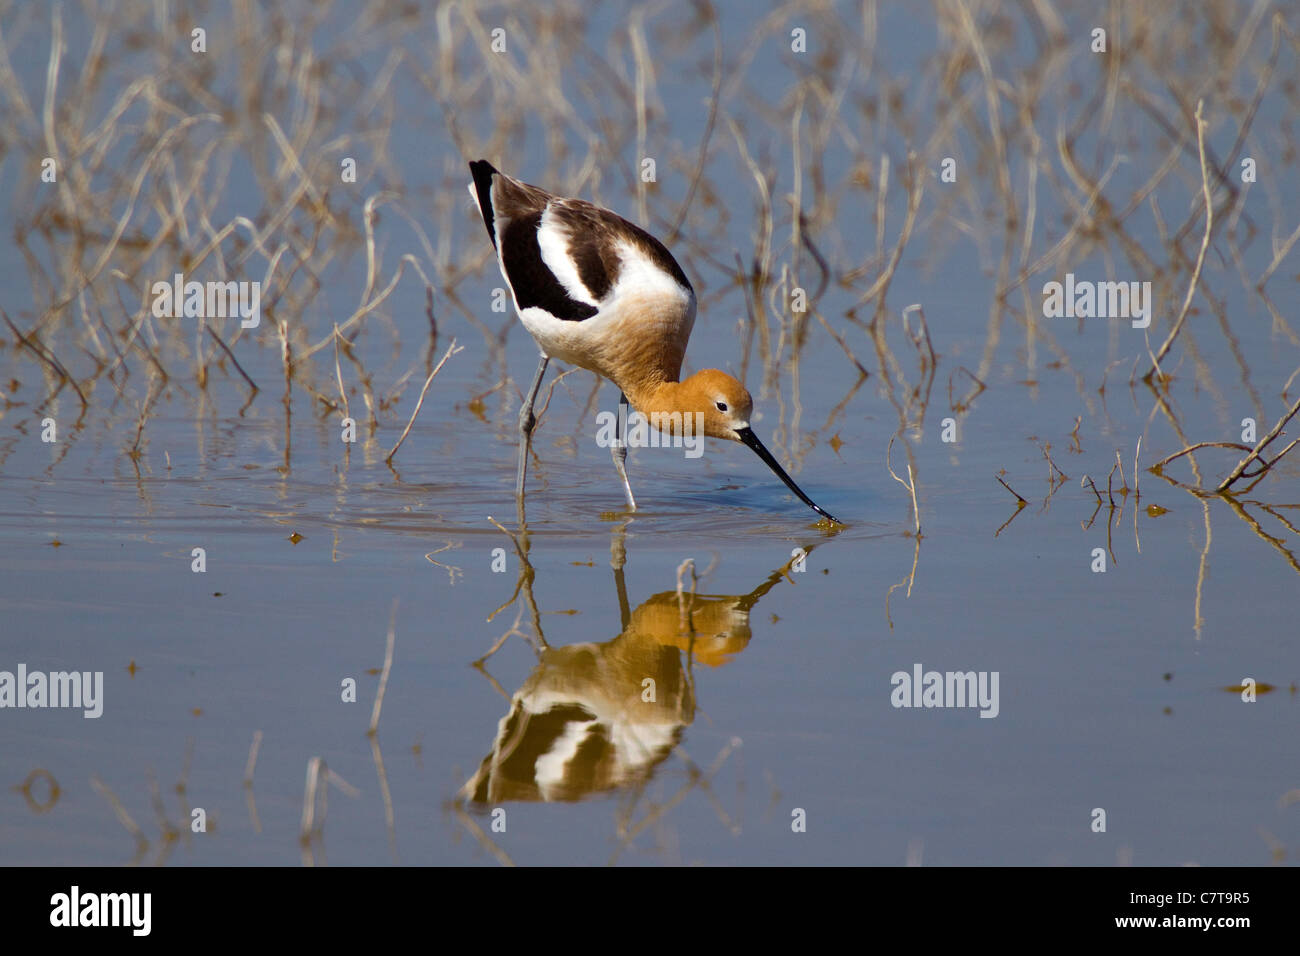 Amerikanische Säbelschnäbler Recurvirostra Americana Klamath Falls, Oregon, USA 9 kann erwachsenen männlichen Stockbild